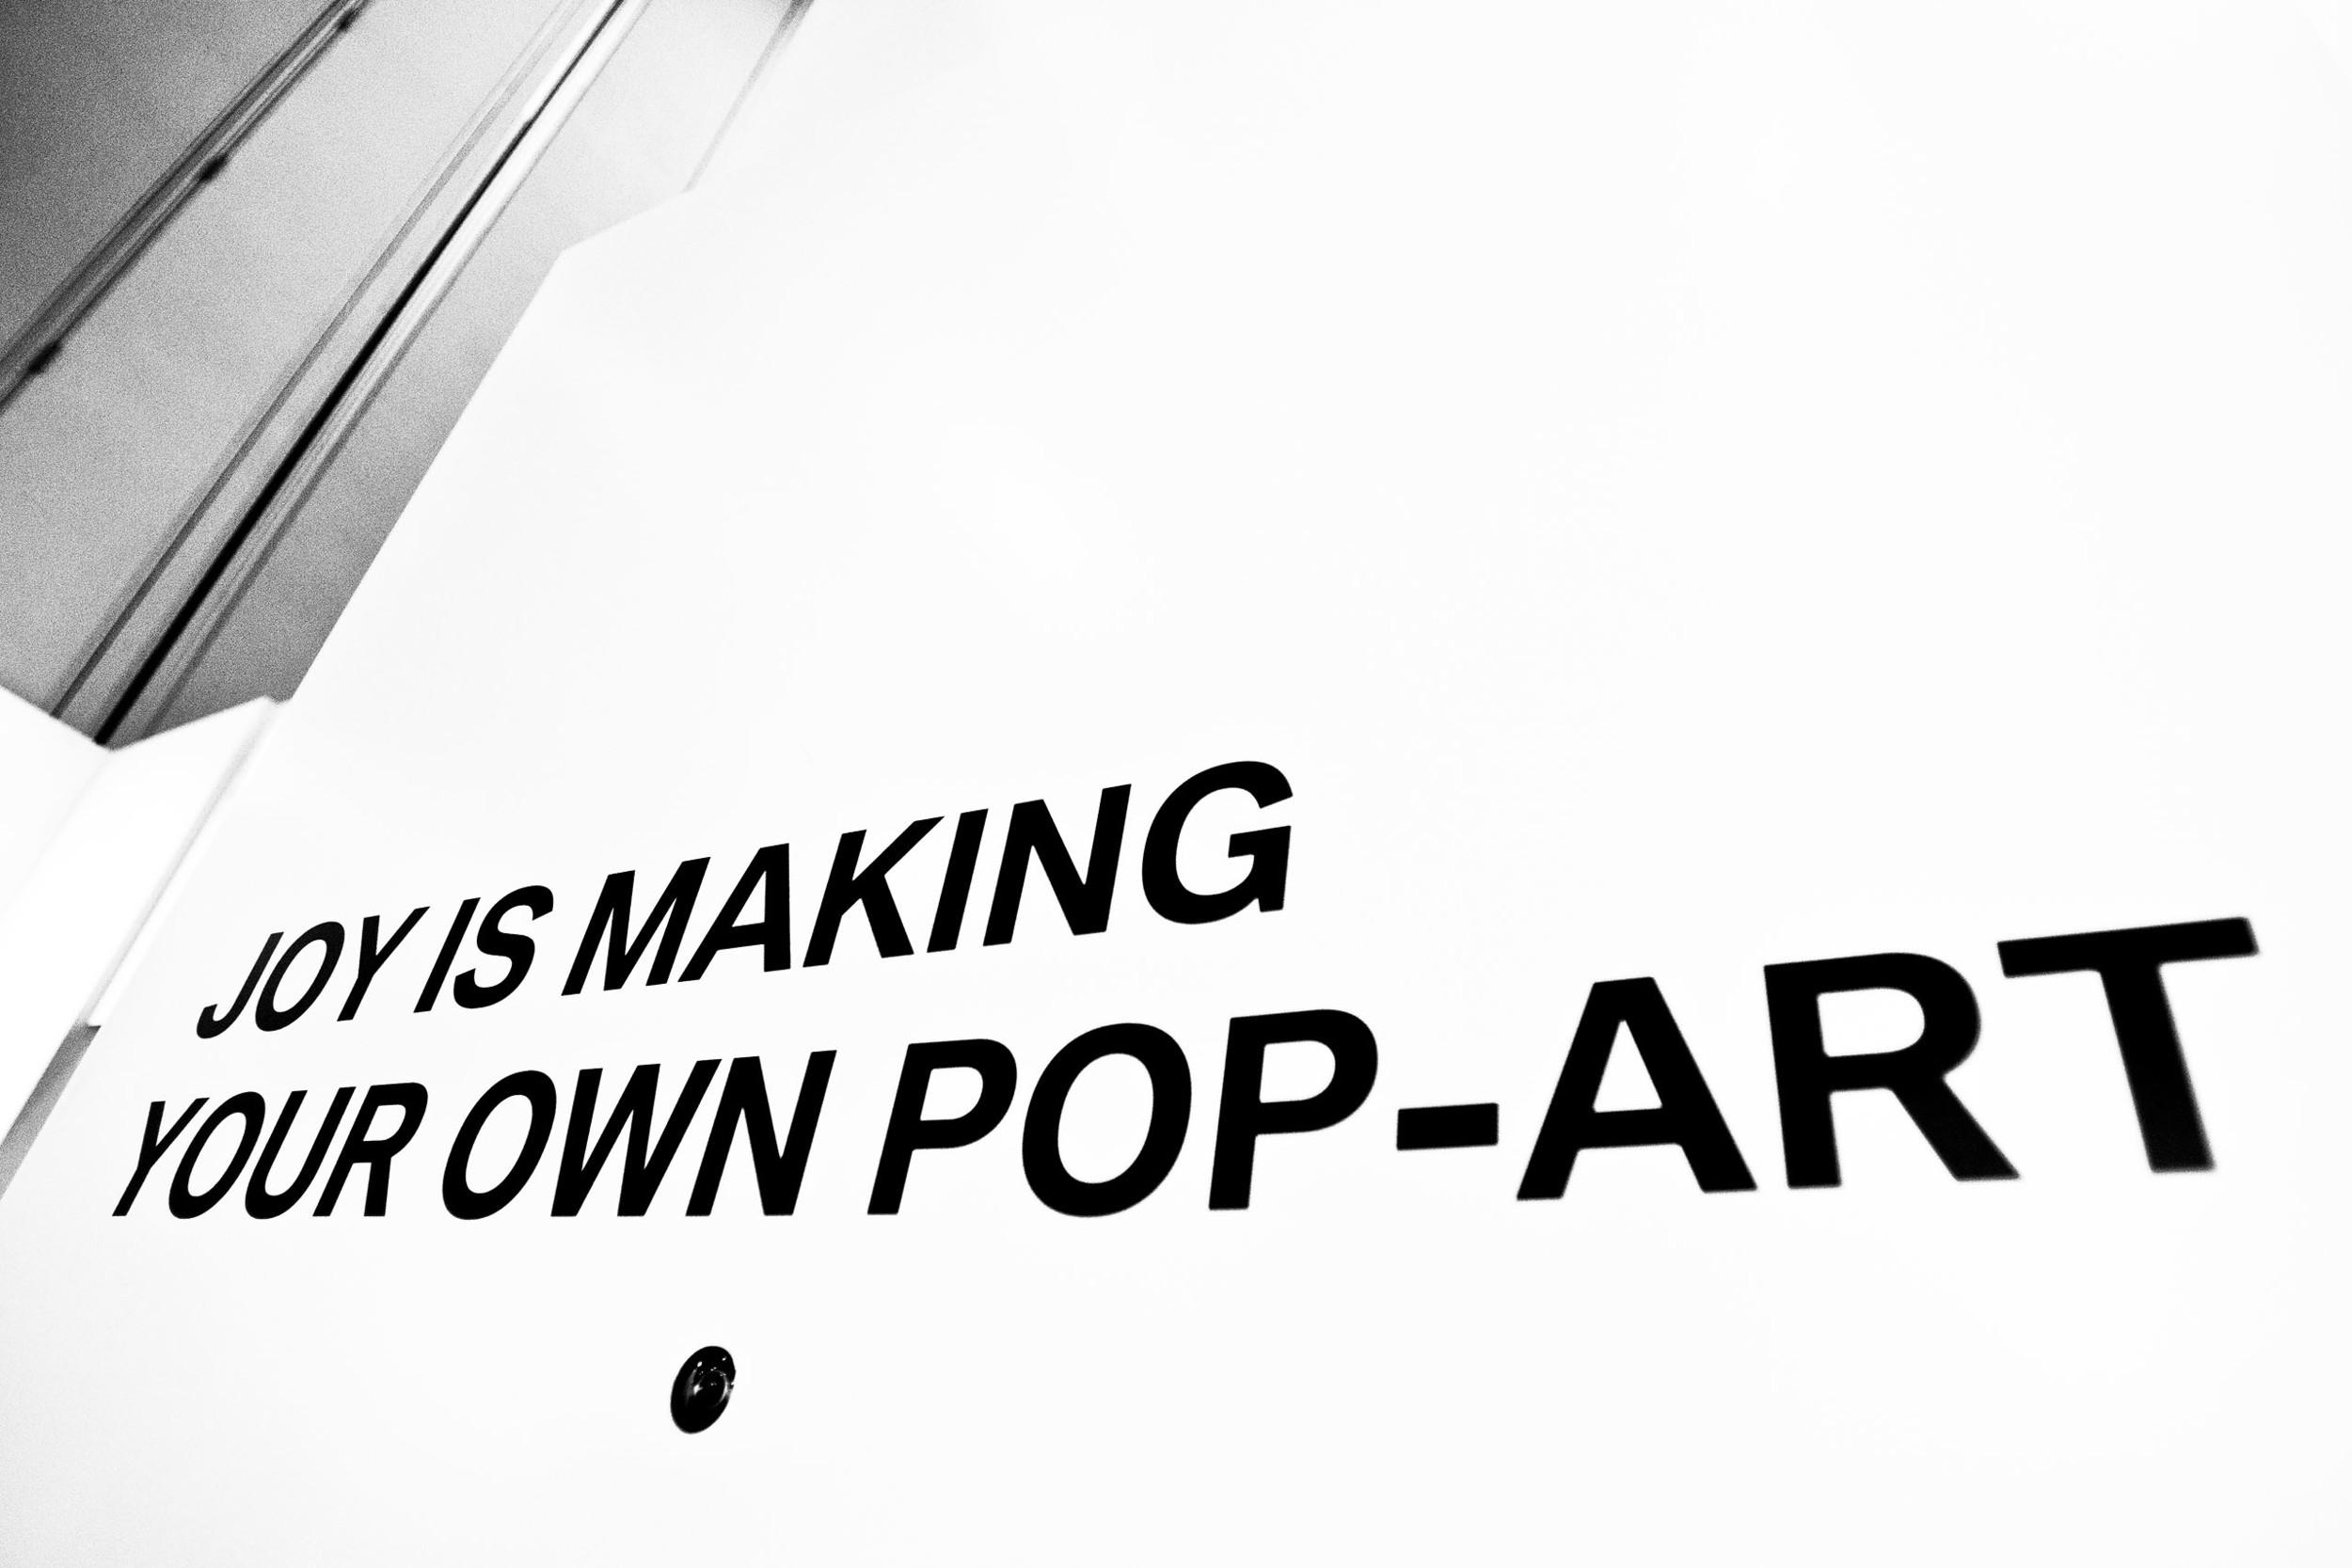 JOY IS MAKING YOUR OWN POP-ART